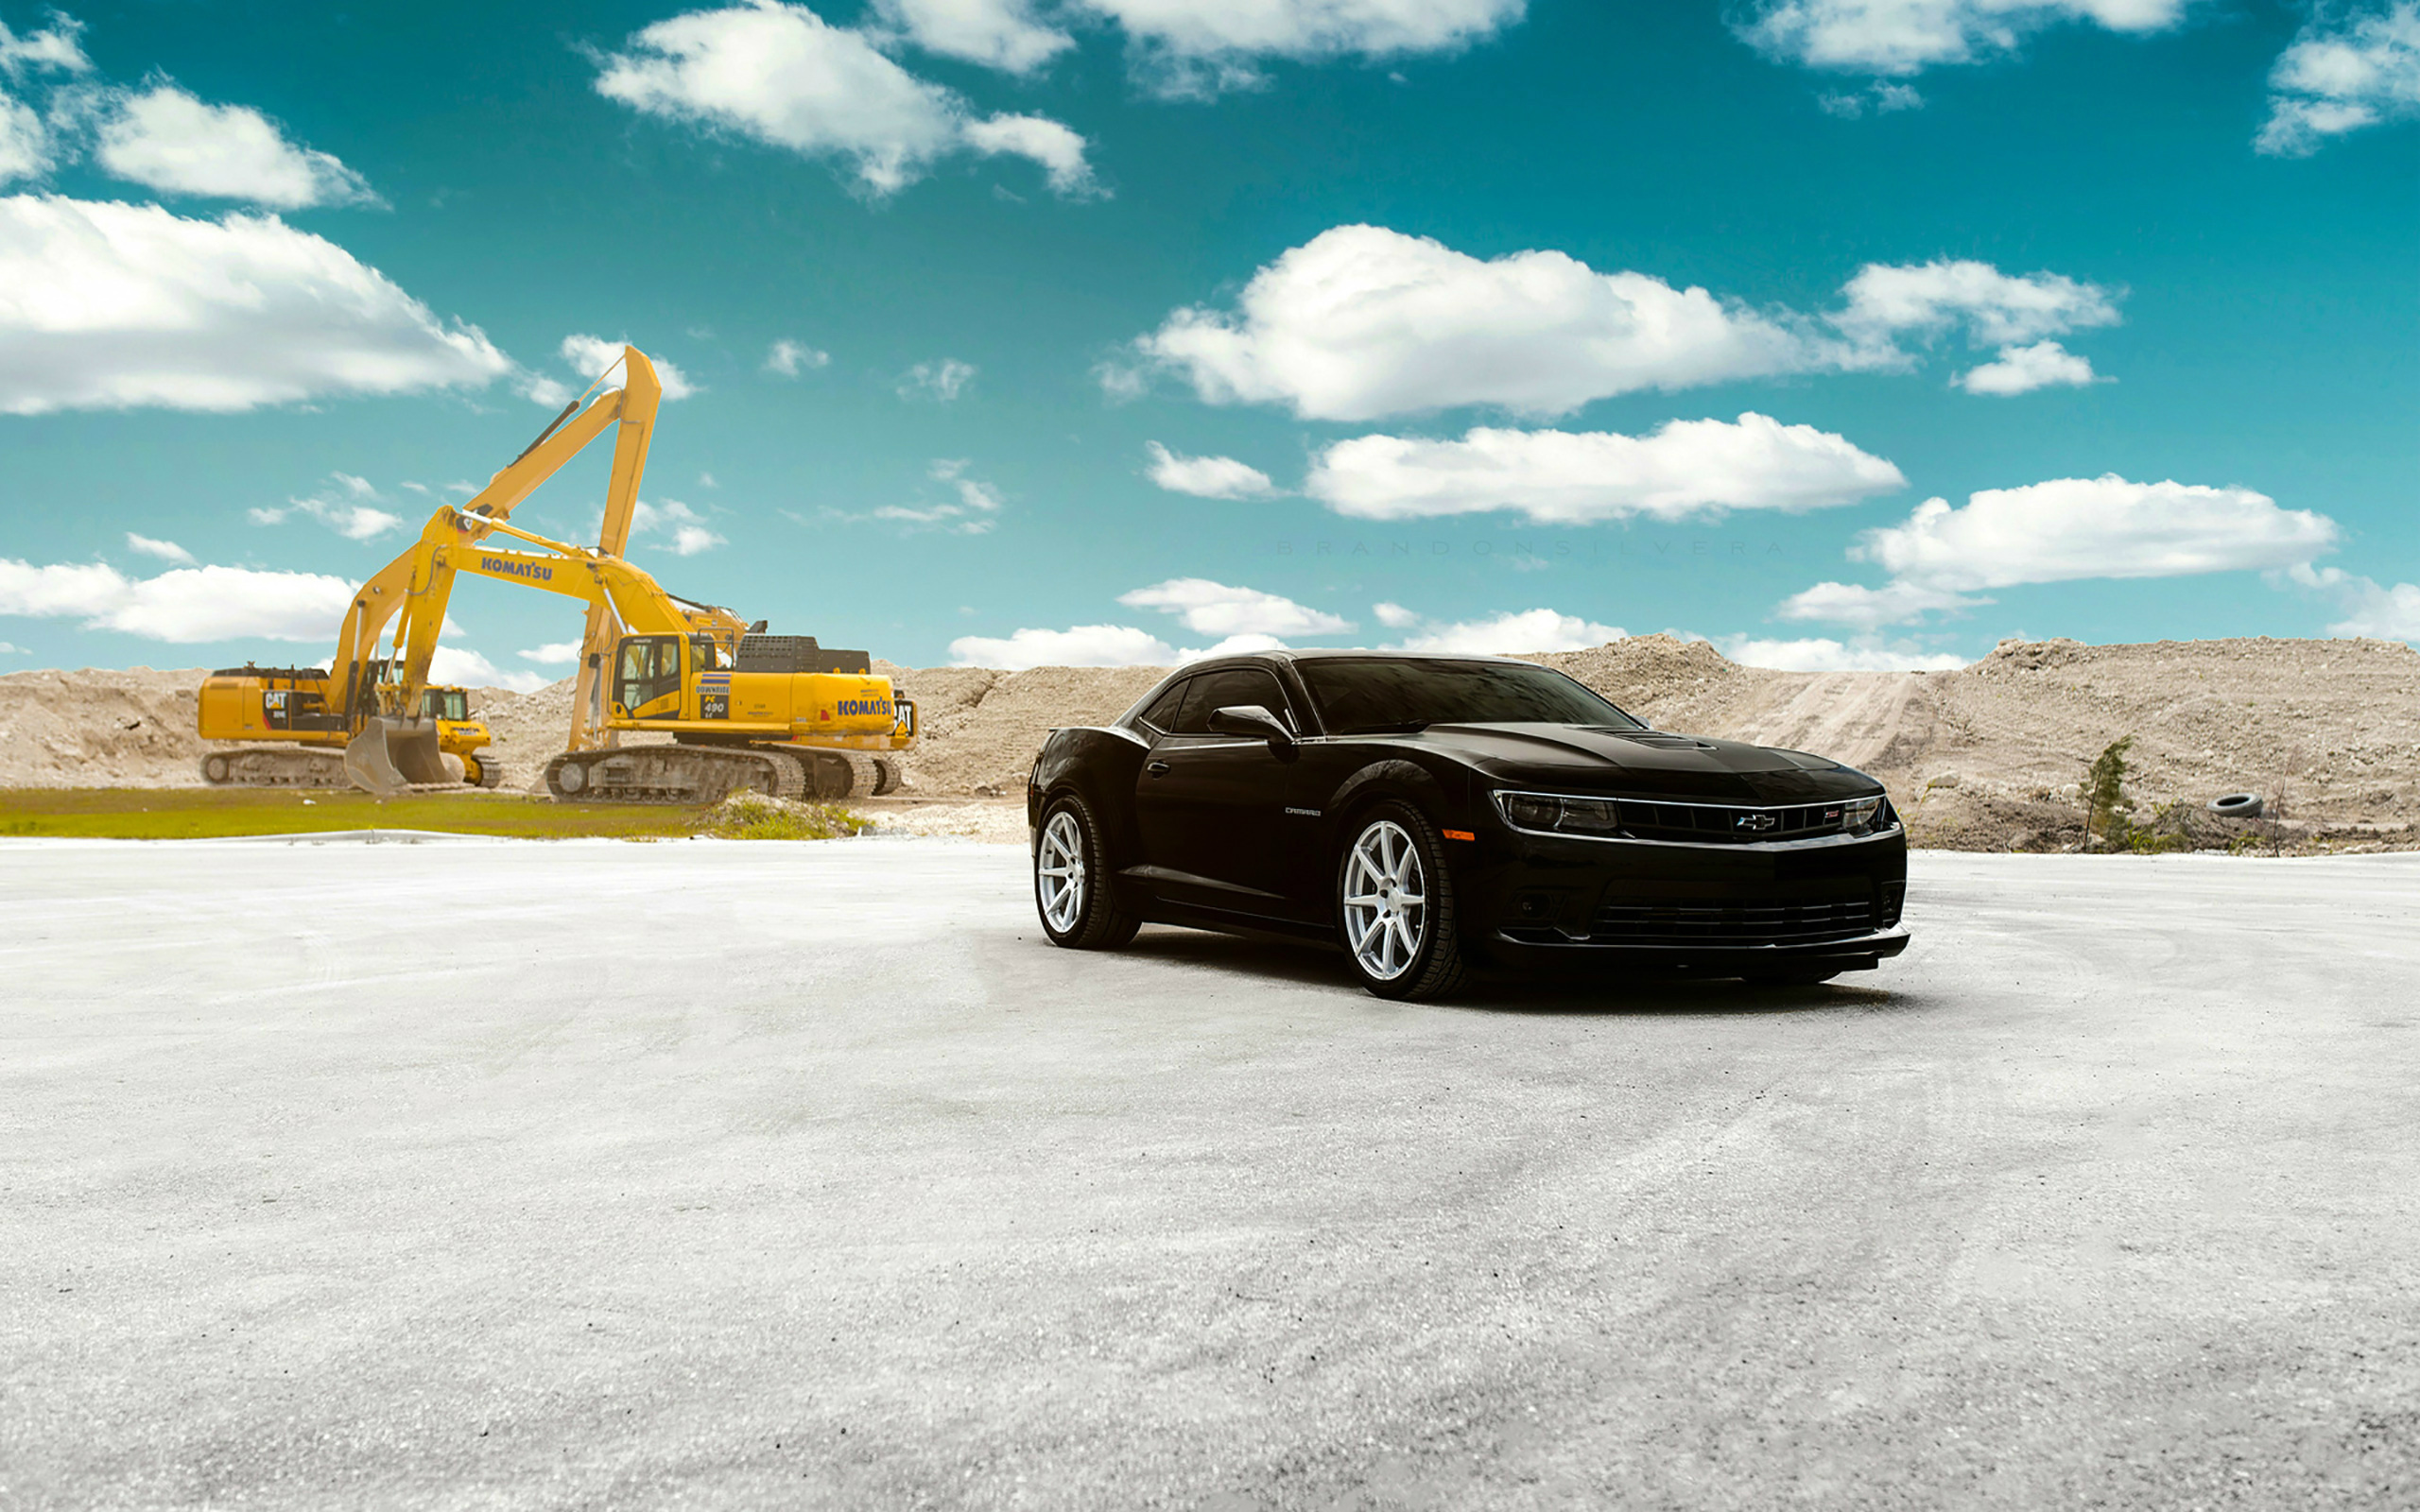 2560x1600 Camaro Black 2560x1600 Resolution Hd 4k Wallpapers